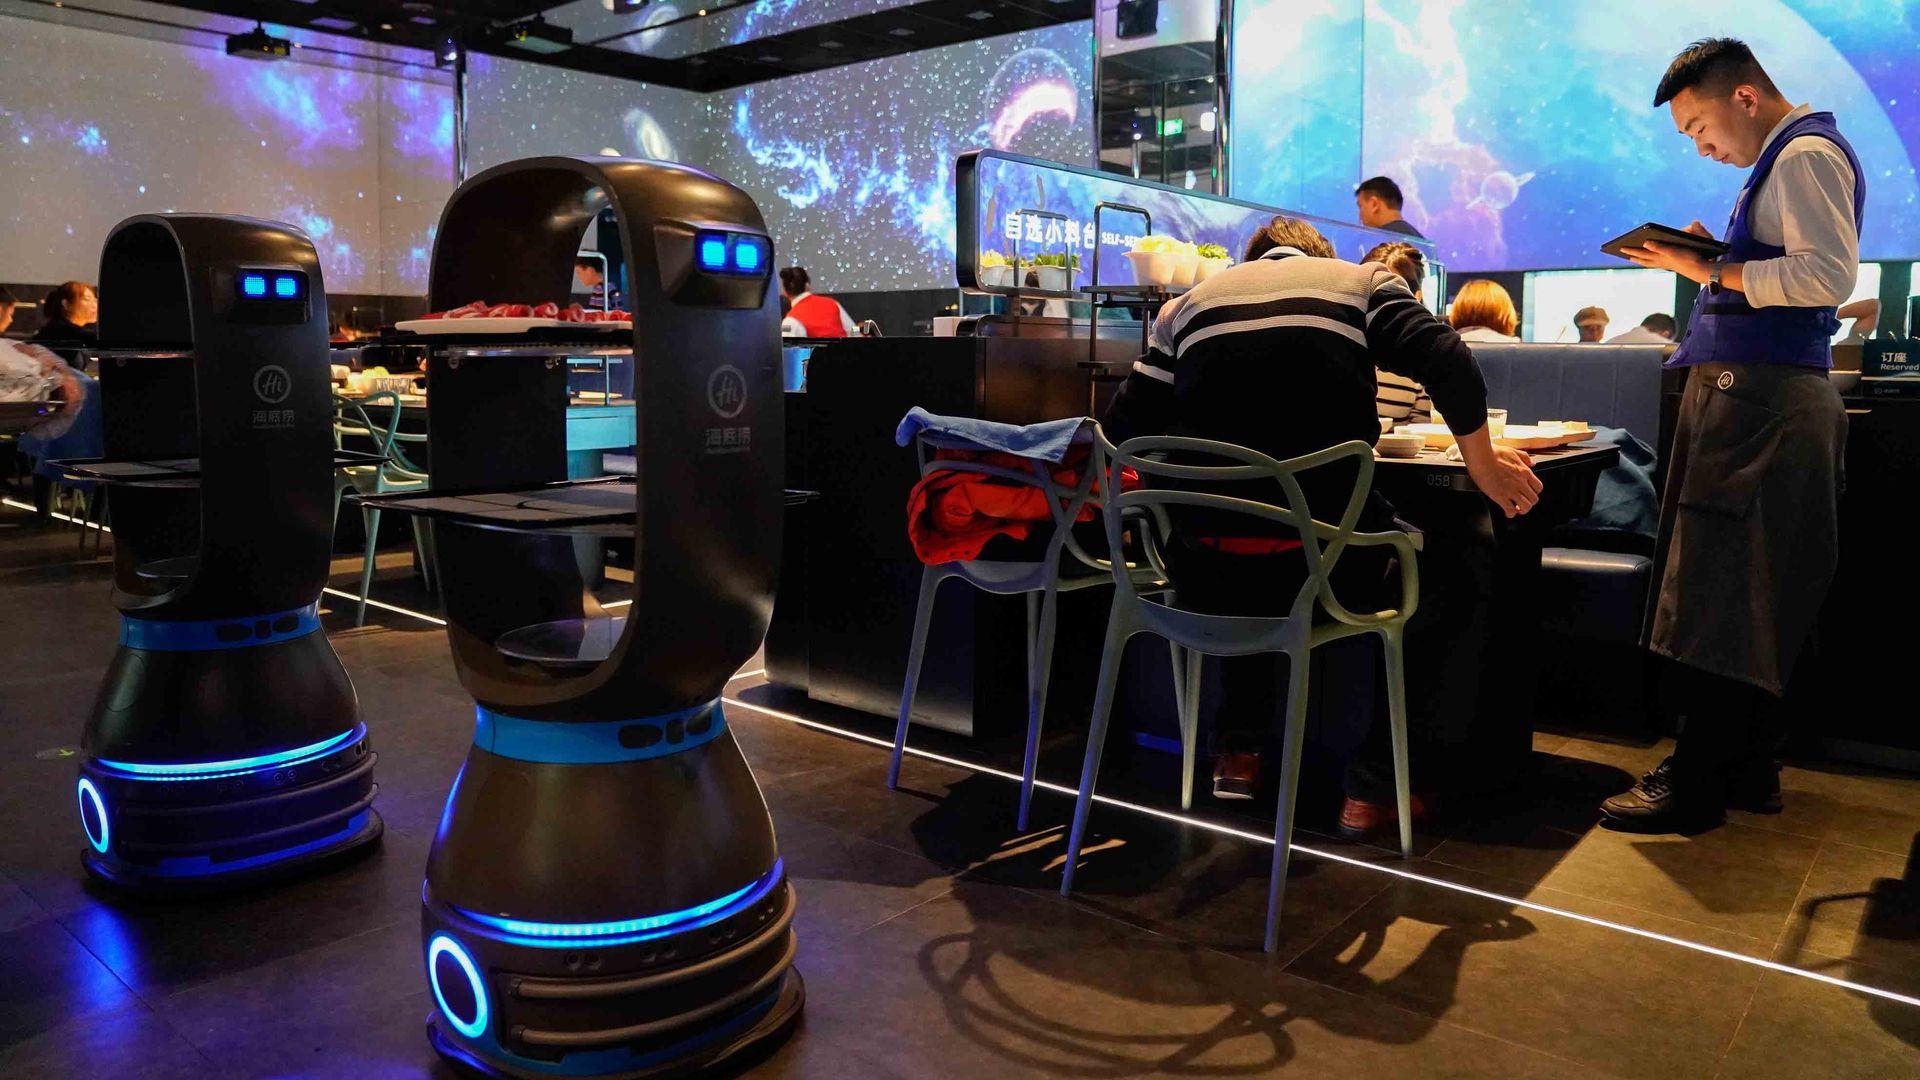 Delivery robots in restaurants